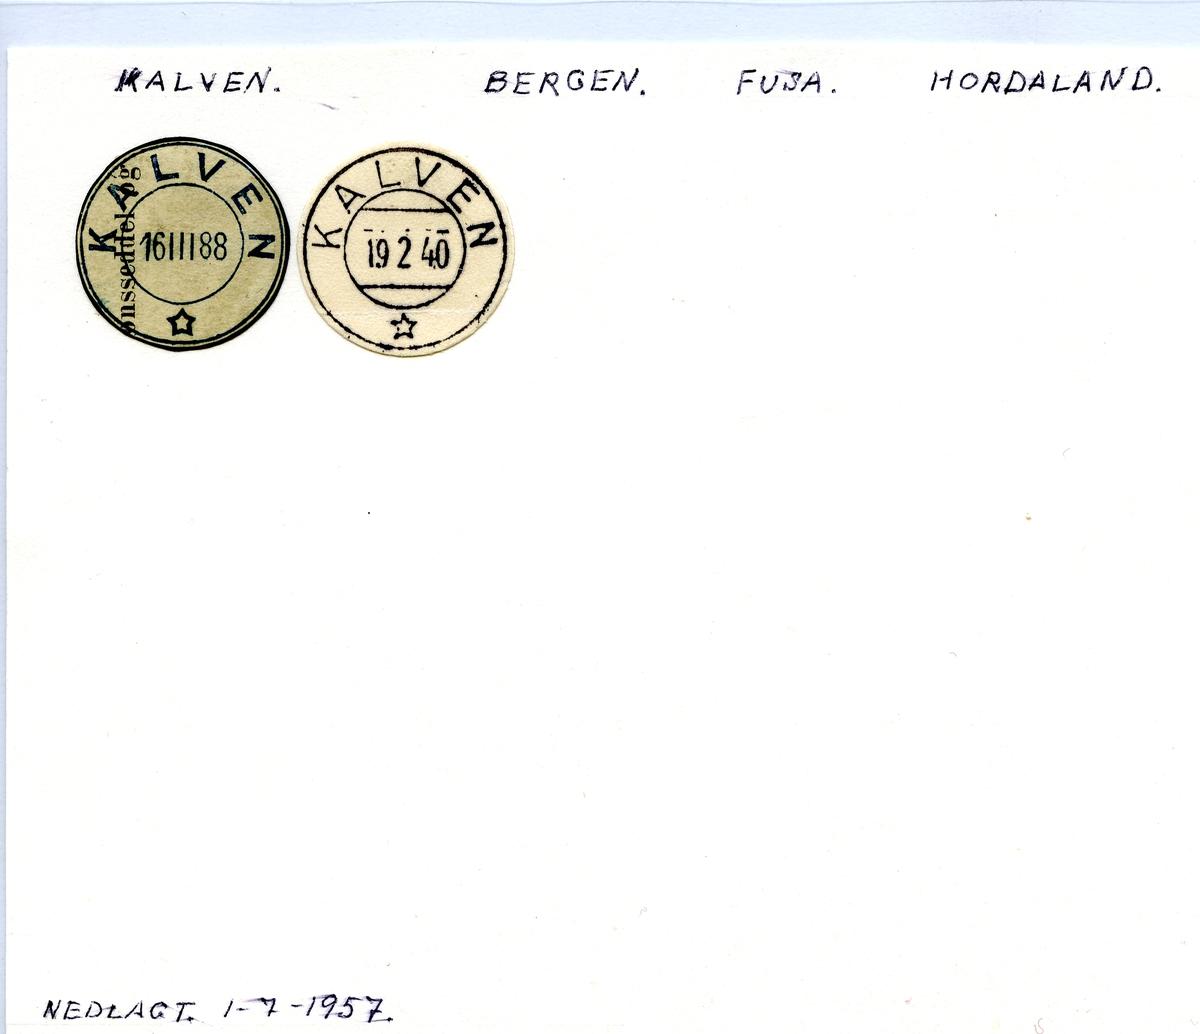 Stempelkatalog.Kalven, Bergen, Fusa kommune, Hordaland